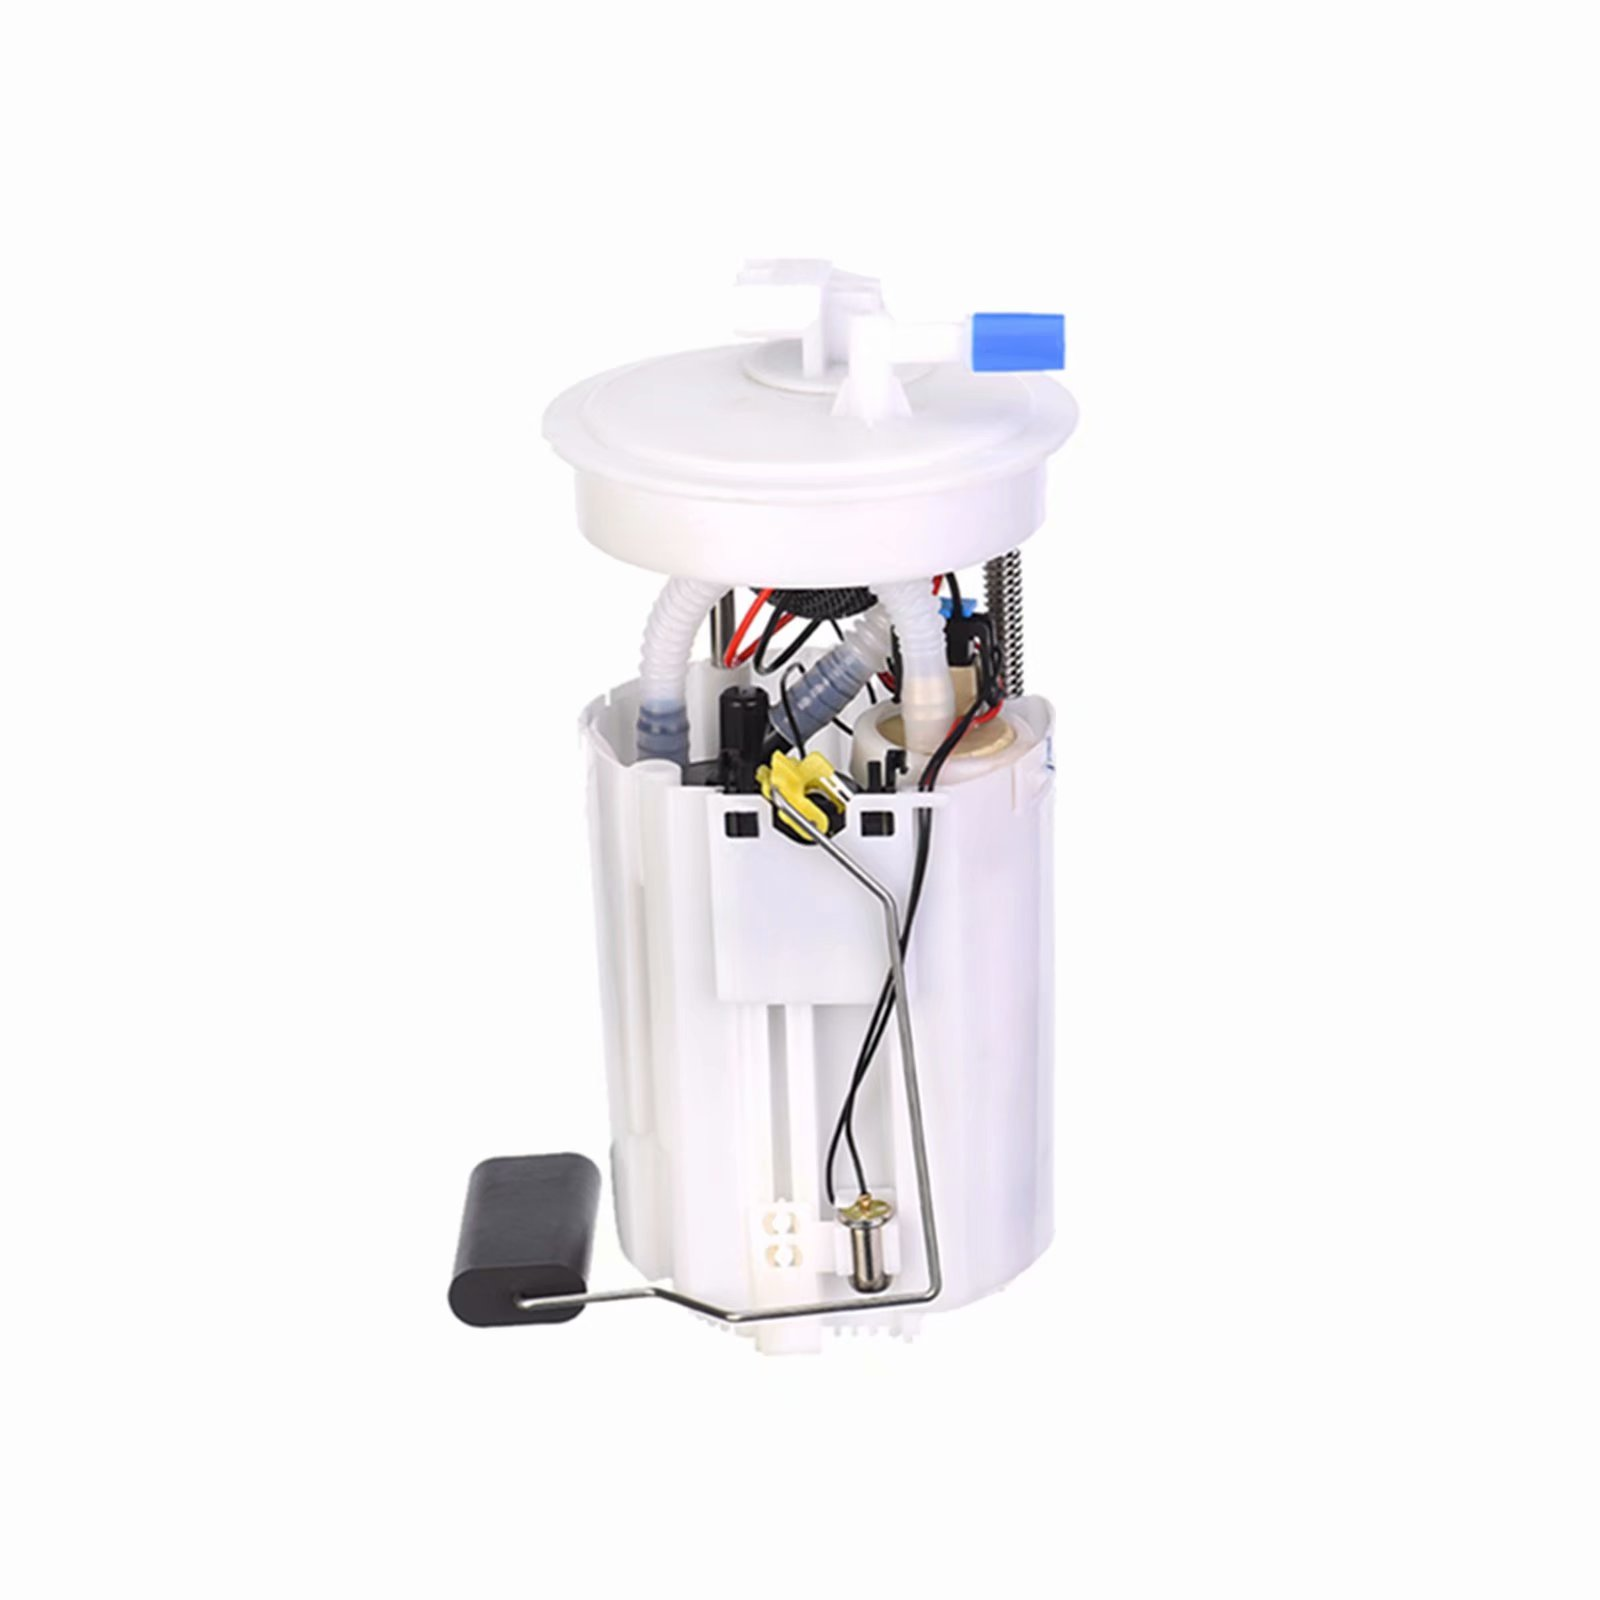 New Fuel Pump /& Assembly P76171M Fits 2002 2003 Altima 2.5L 3.5L 170408J105